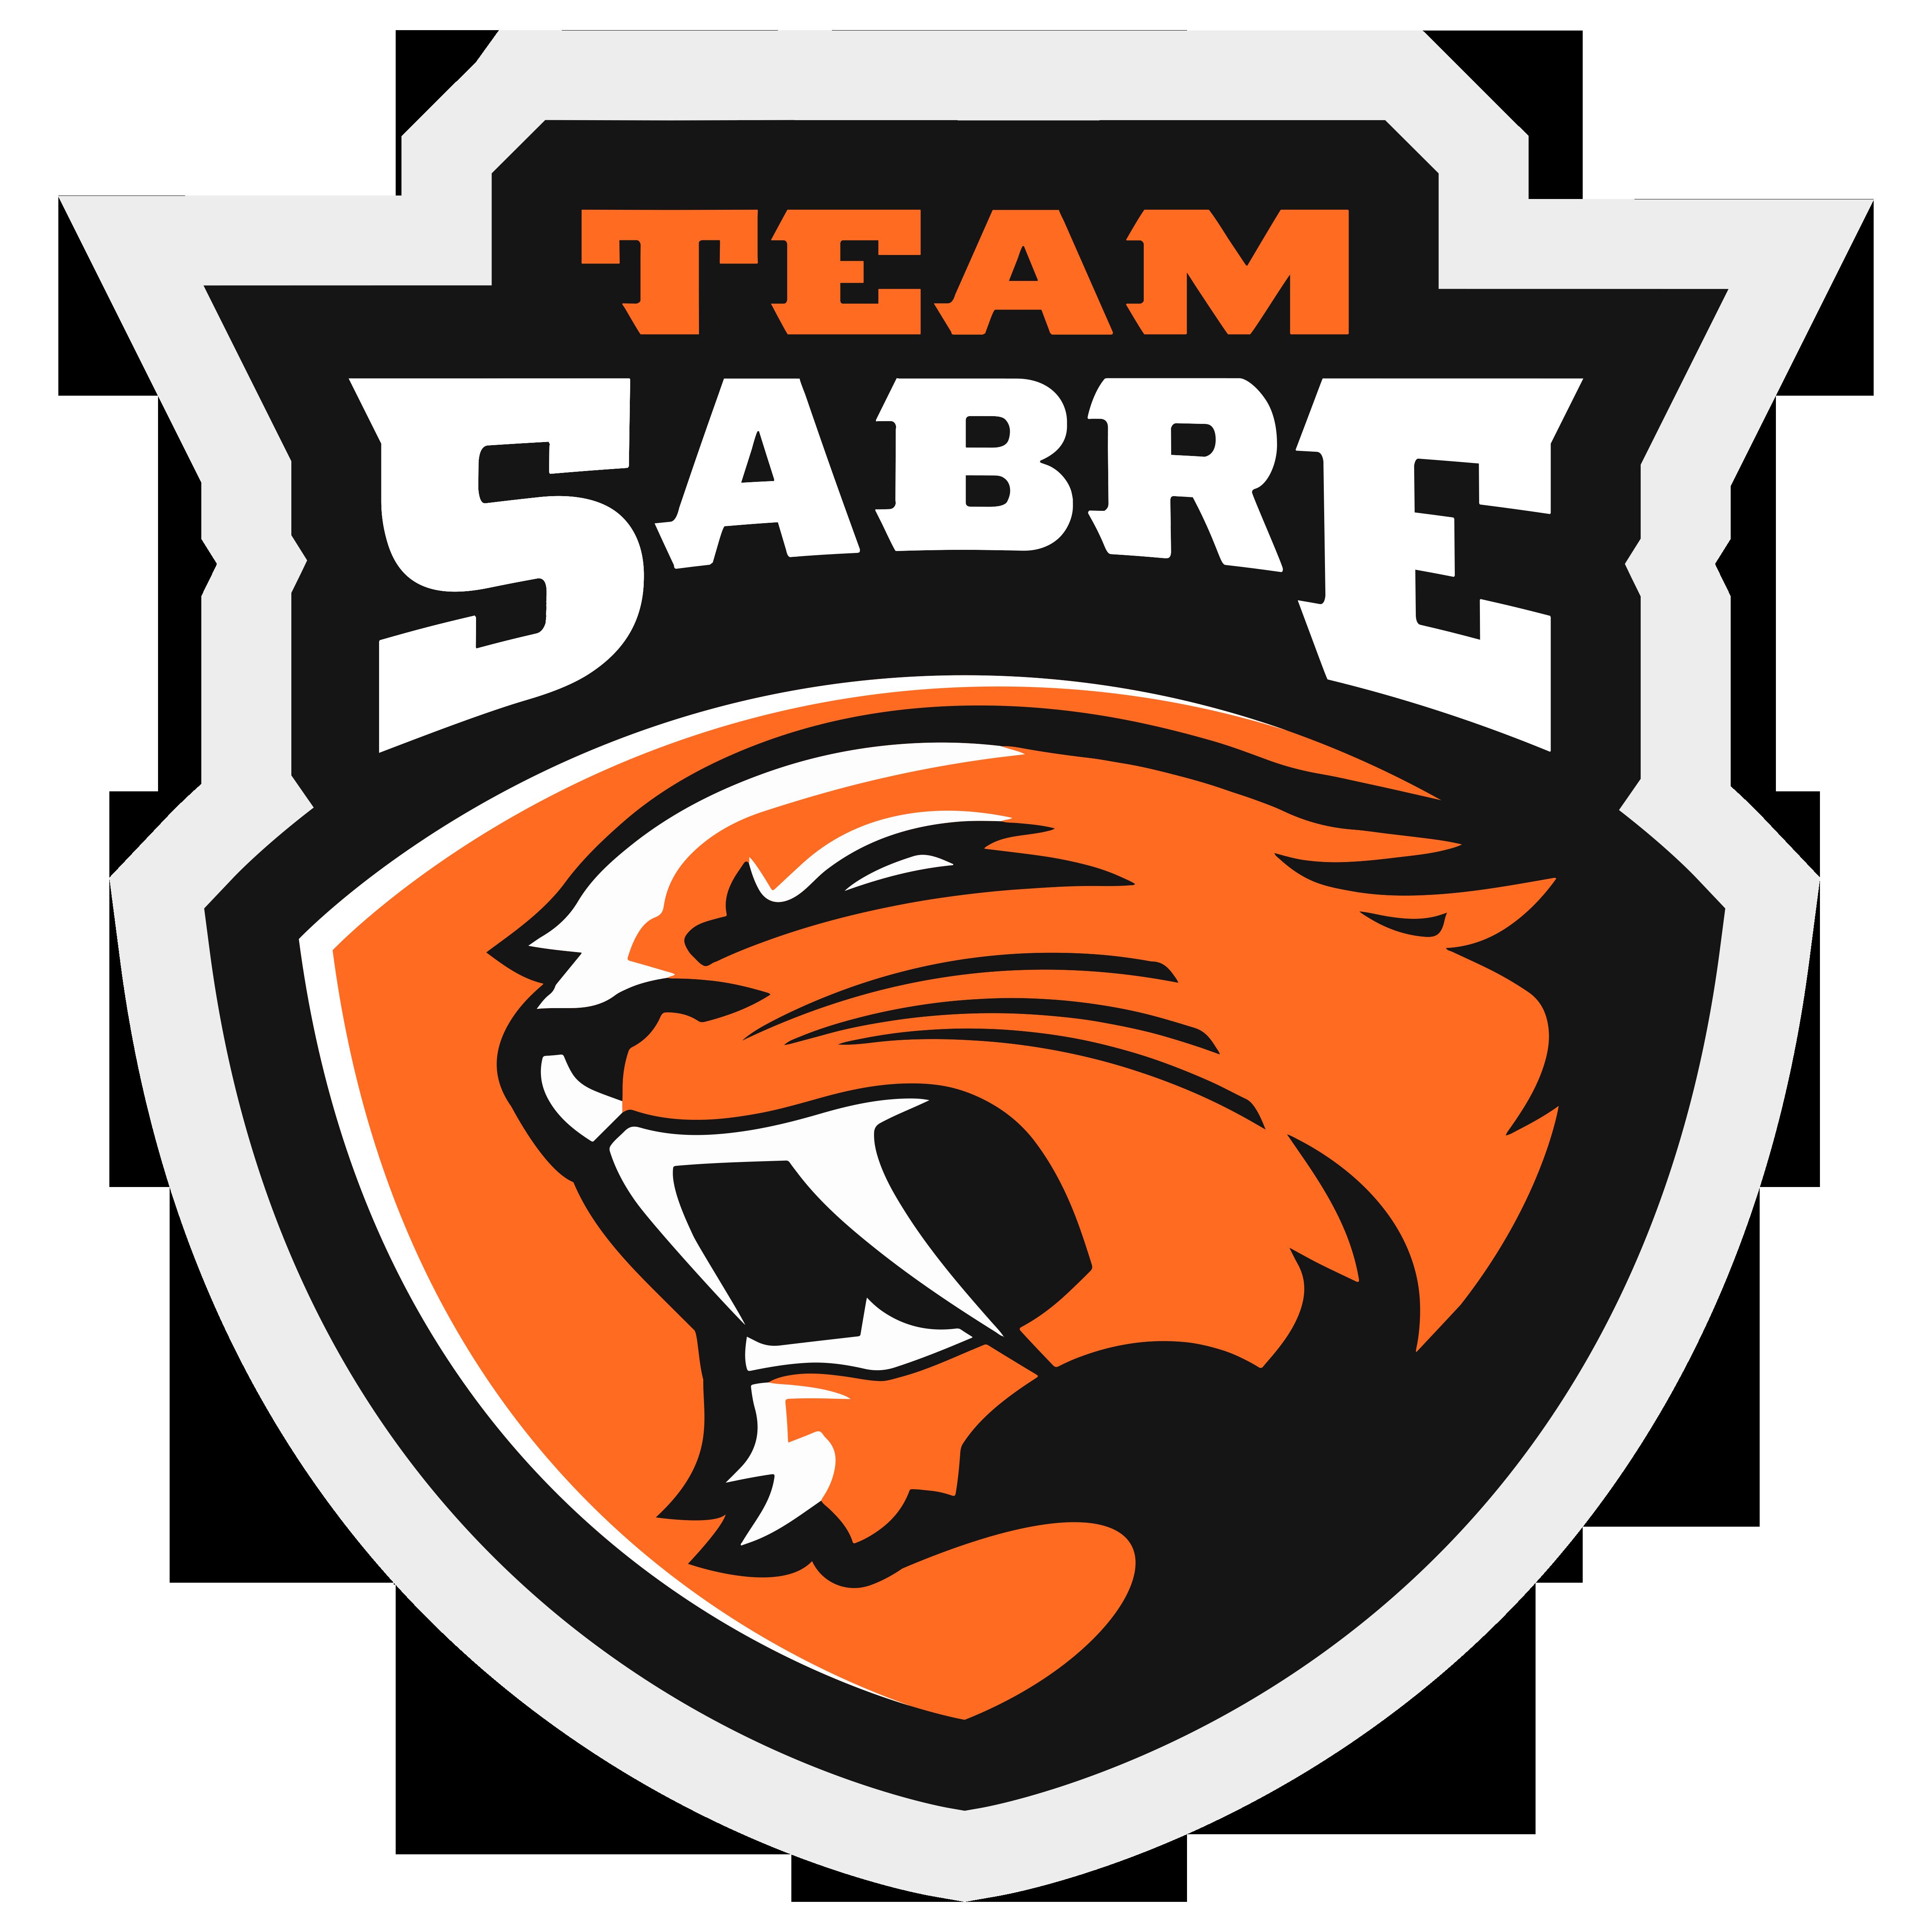 Team sabre transparent ai. Teamwork clipart logo